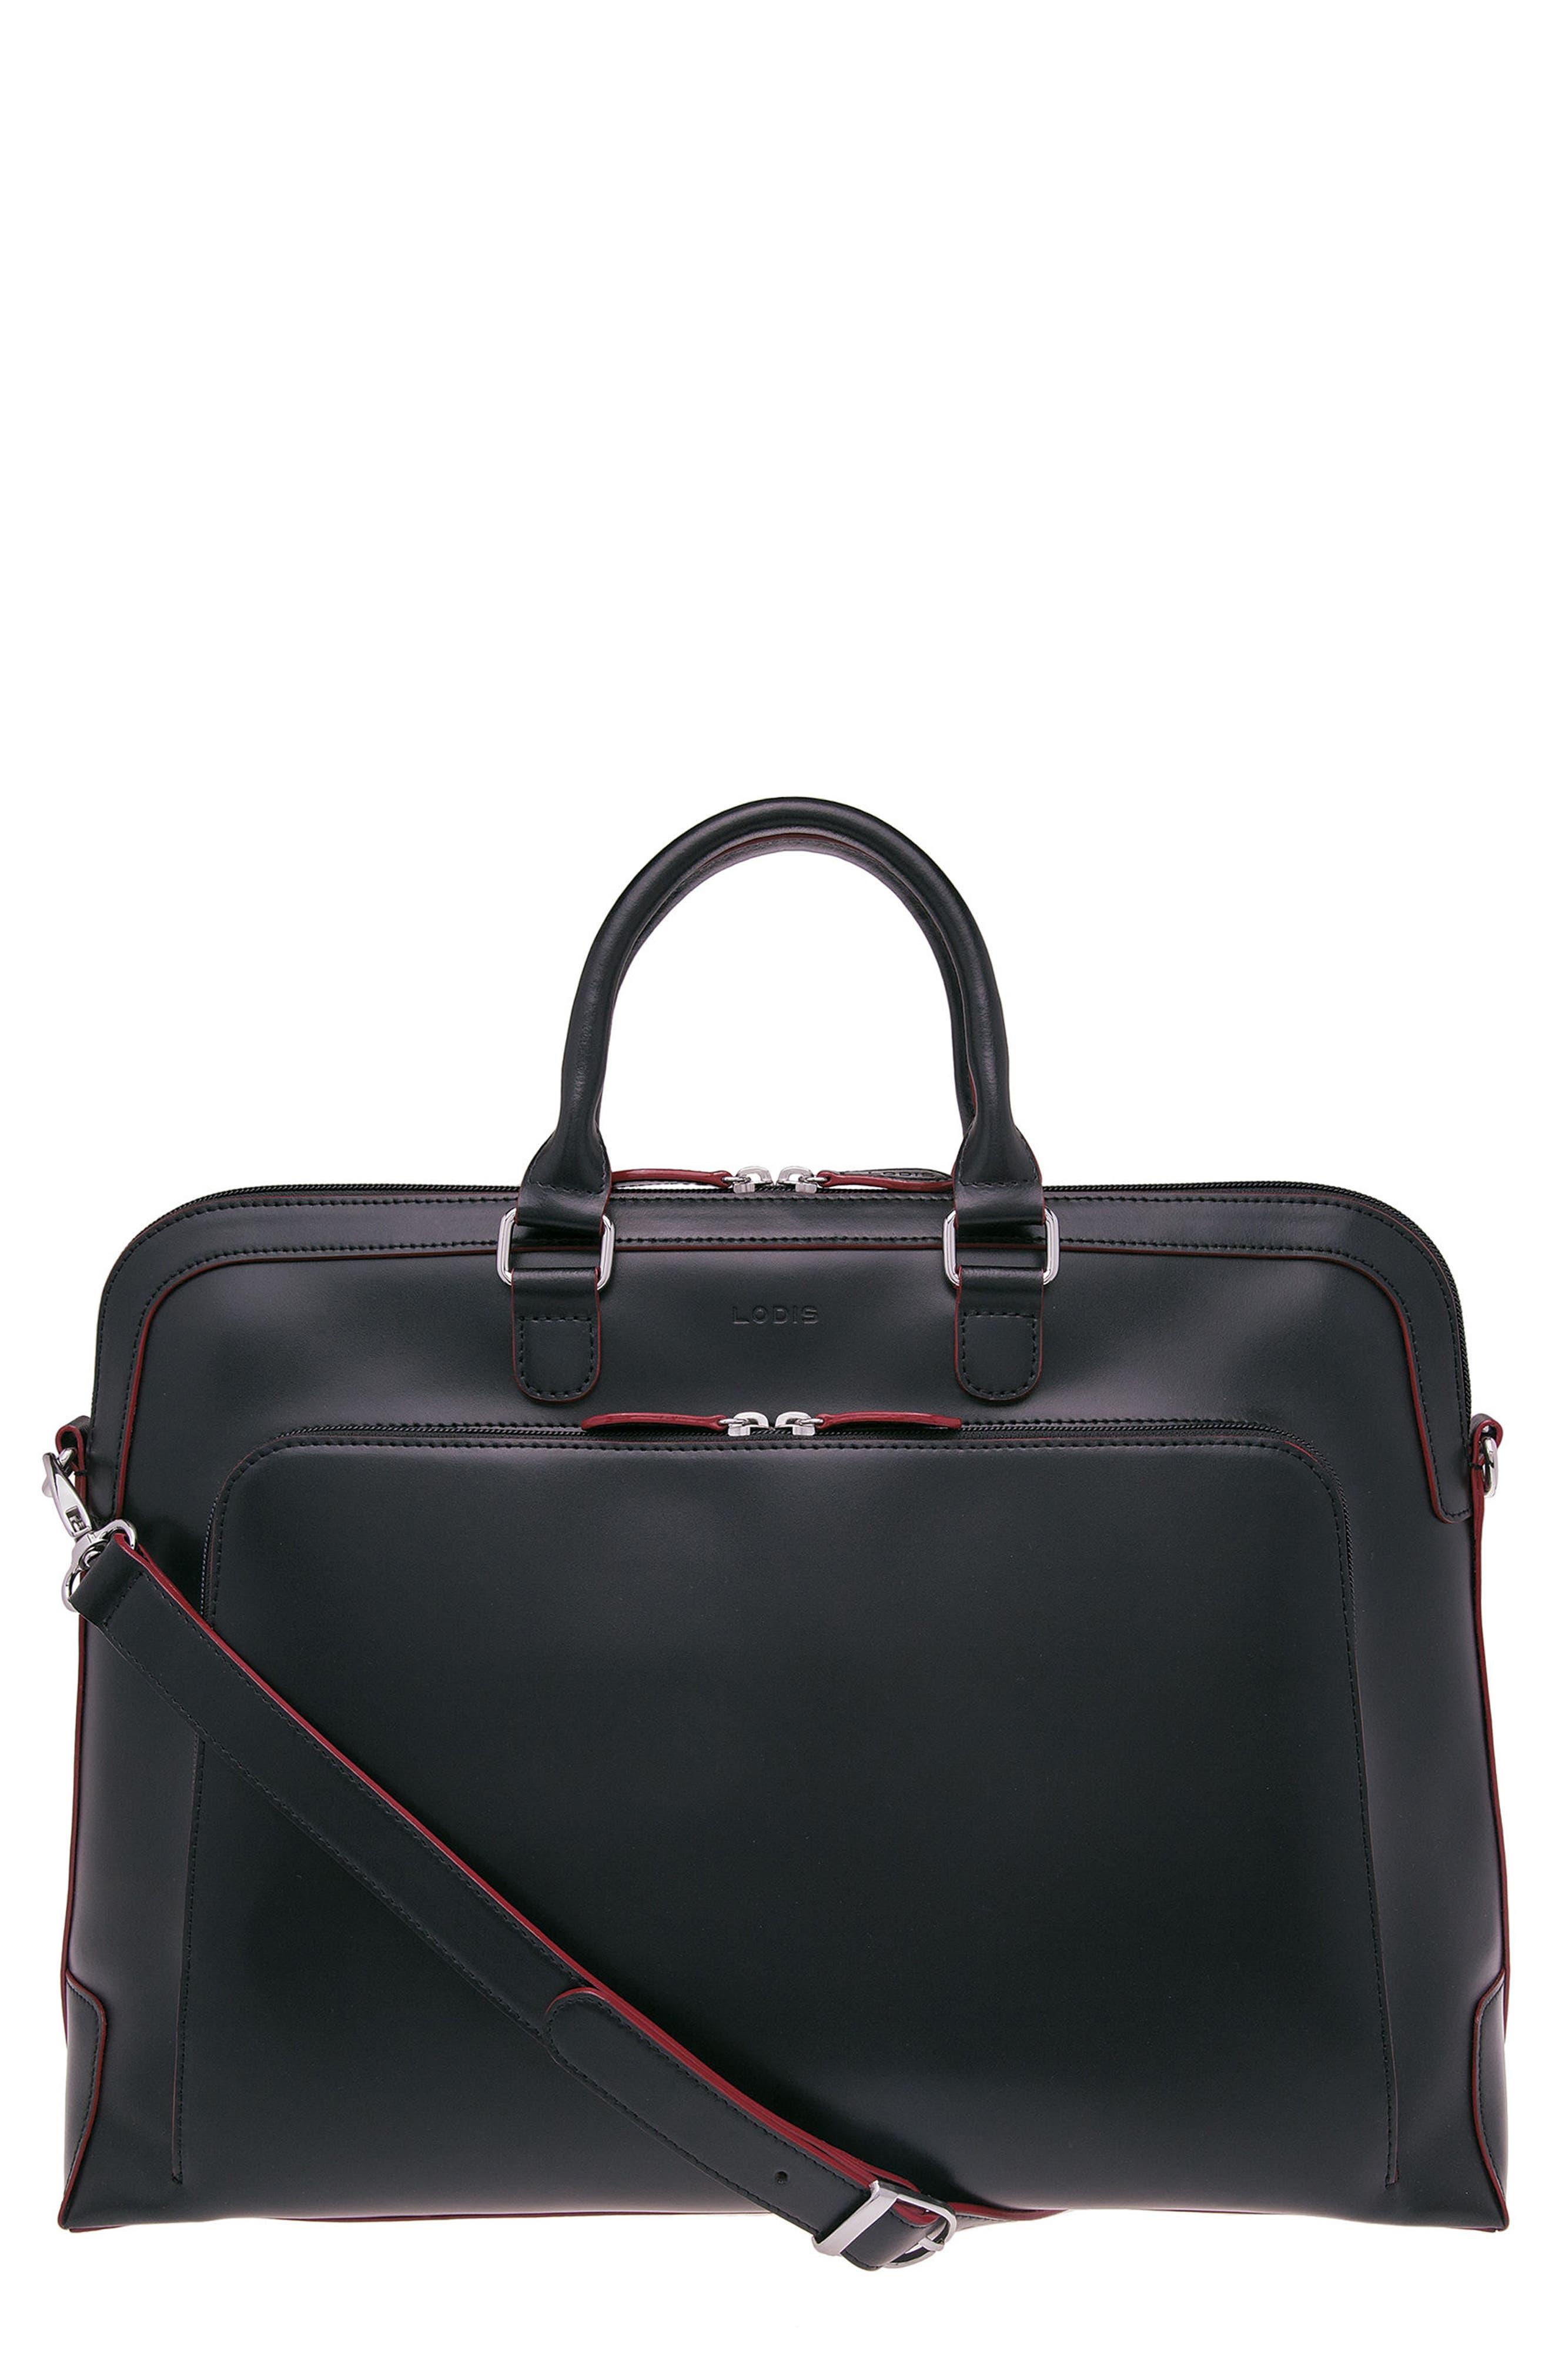 Lodis 'Audrey Brera' Leather Briefcase,                             Main thumbnail 1, color,                             001